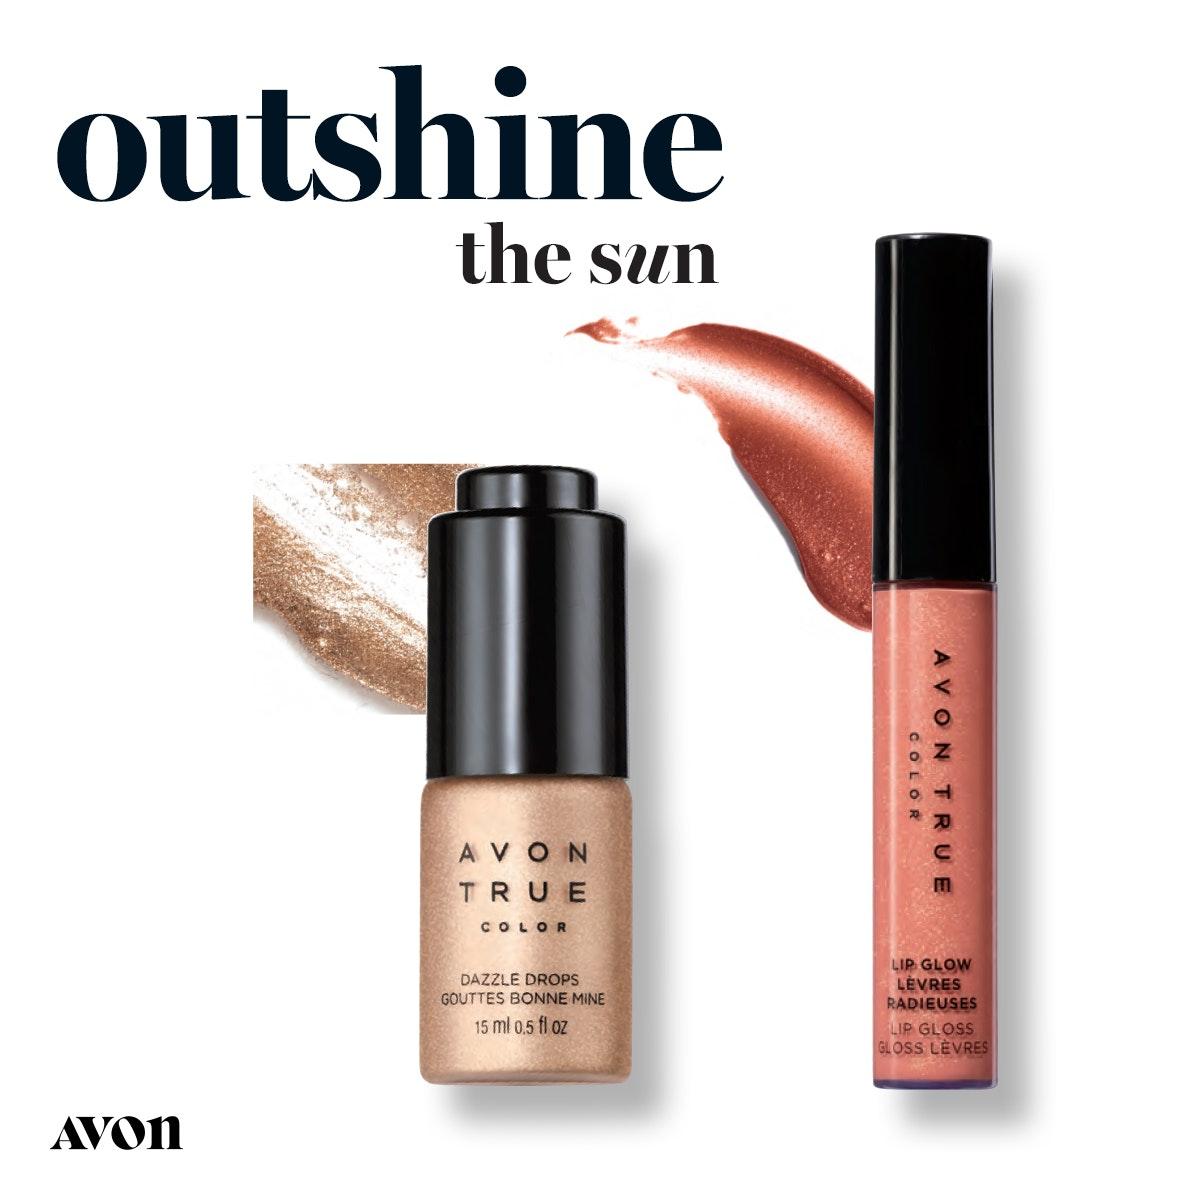 Avon True Color Dazzle Drops.  Sunkissed Shimmer. https://www.avon.com/product/avon-true-color-dazzle-drops-61117?rep=mybeauty